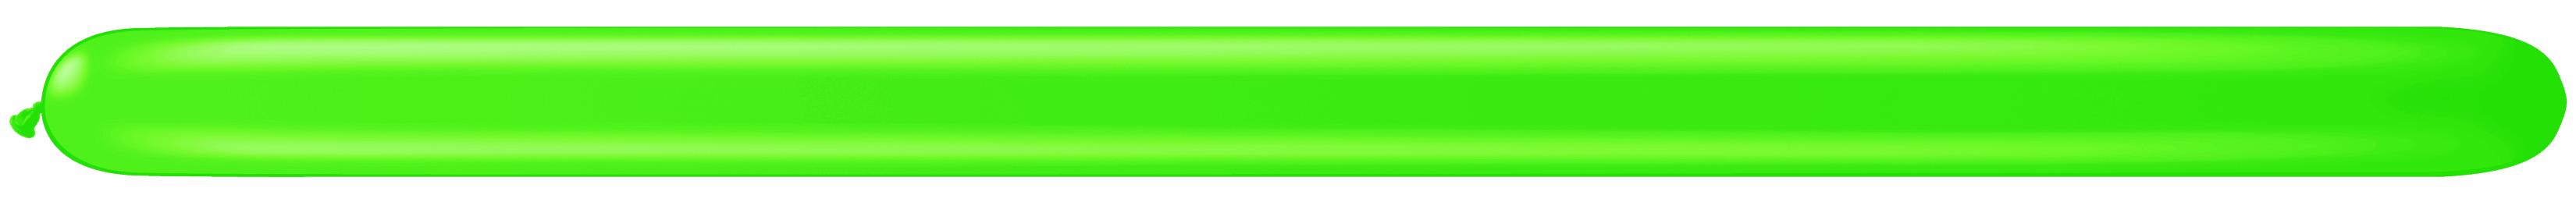 260Q Spring Green Twister Balloons 50 Count Q-PAK